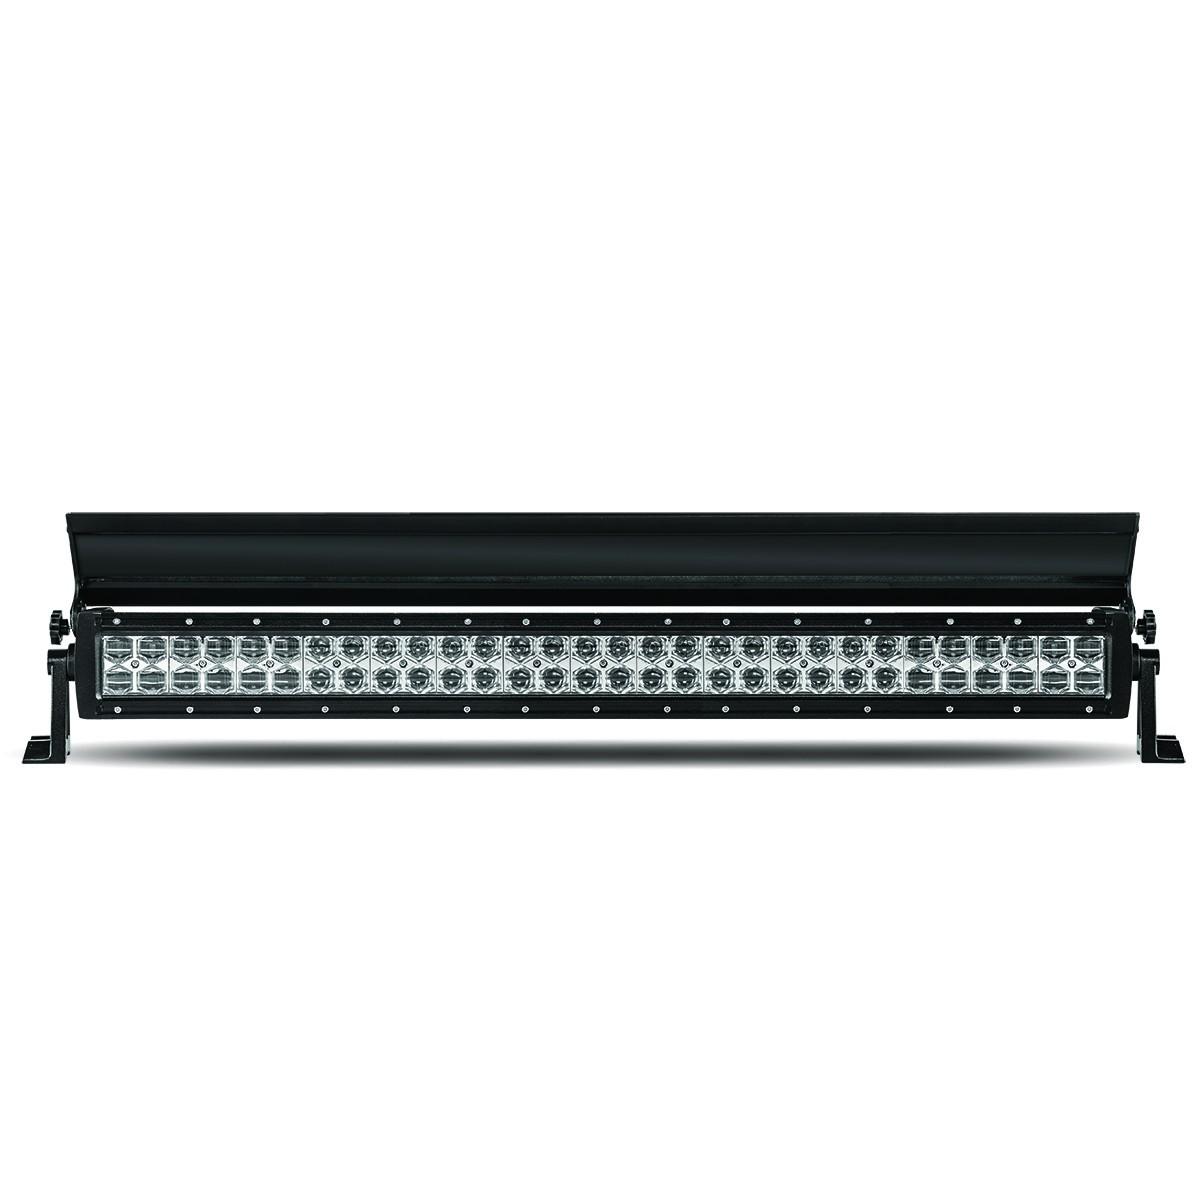 32 double row led light bar with cover spotflood beam 12600 32 double row led light bar with cover spotflood beam 12600 aloadofball Images